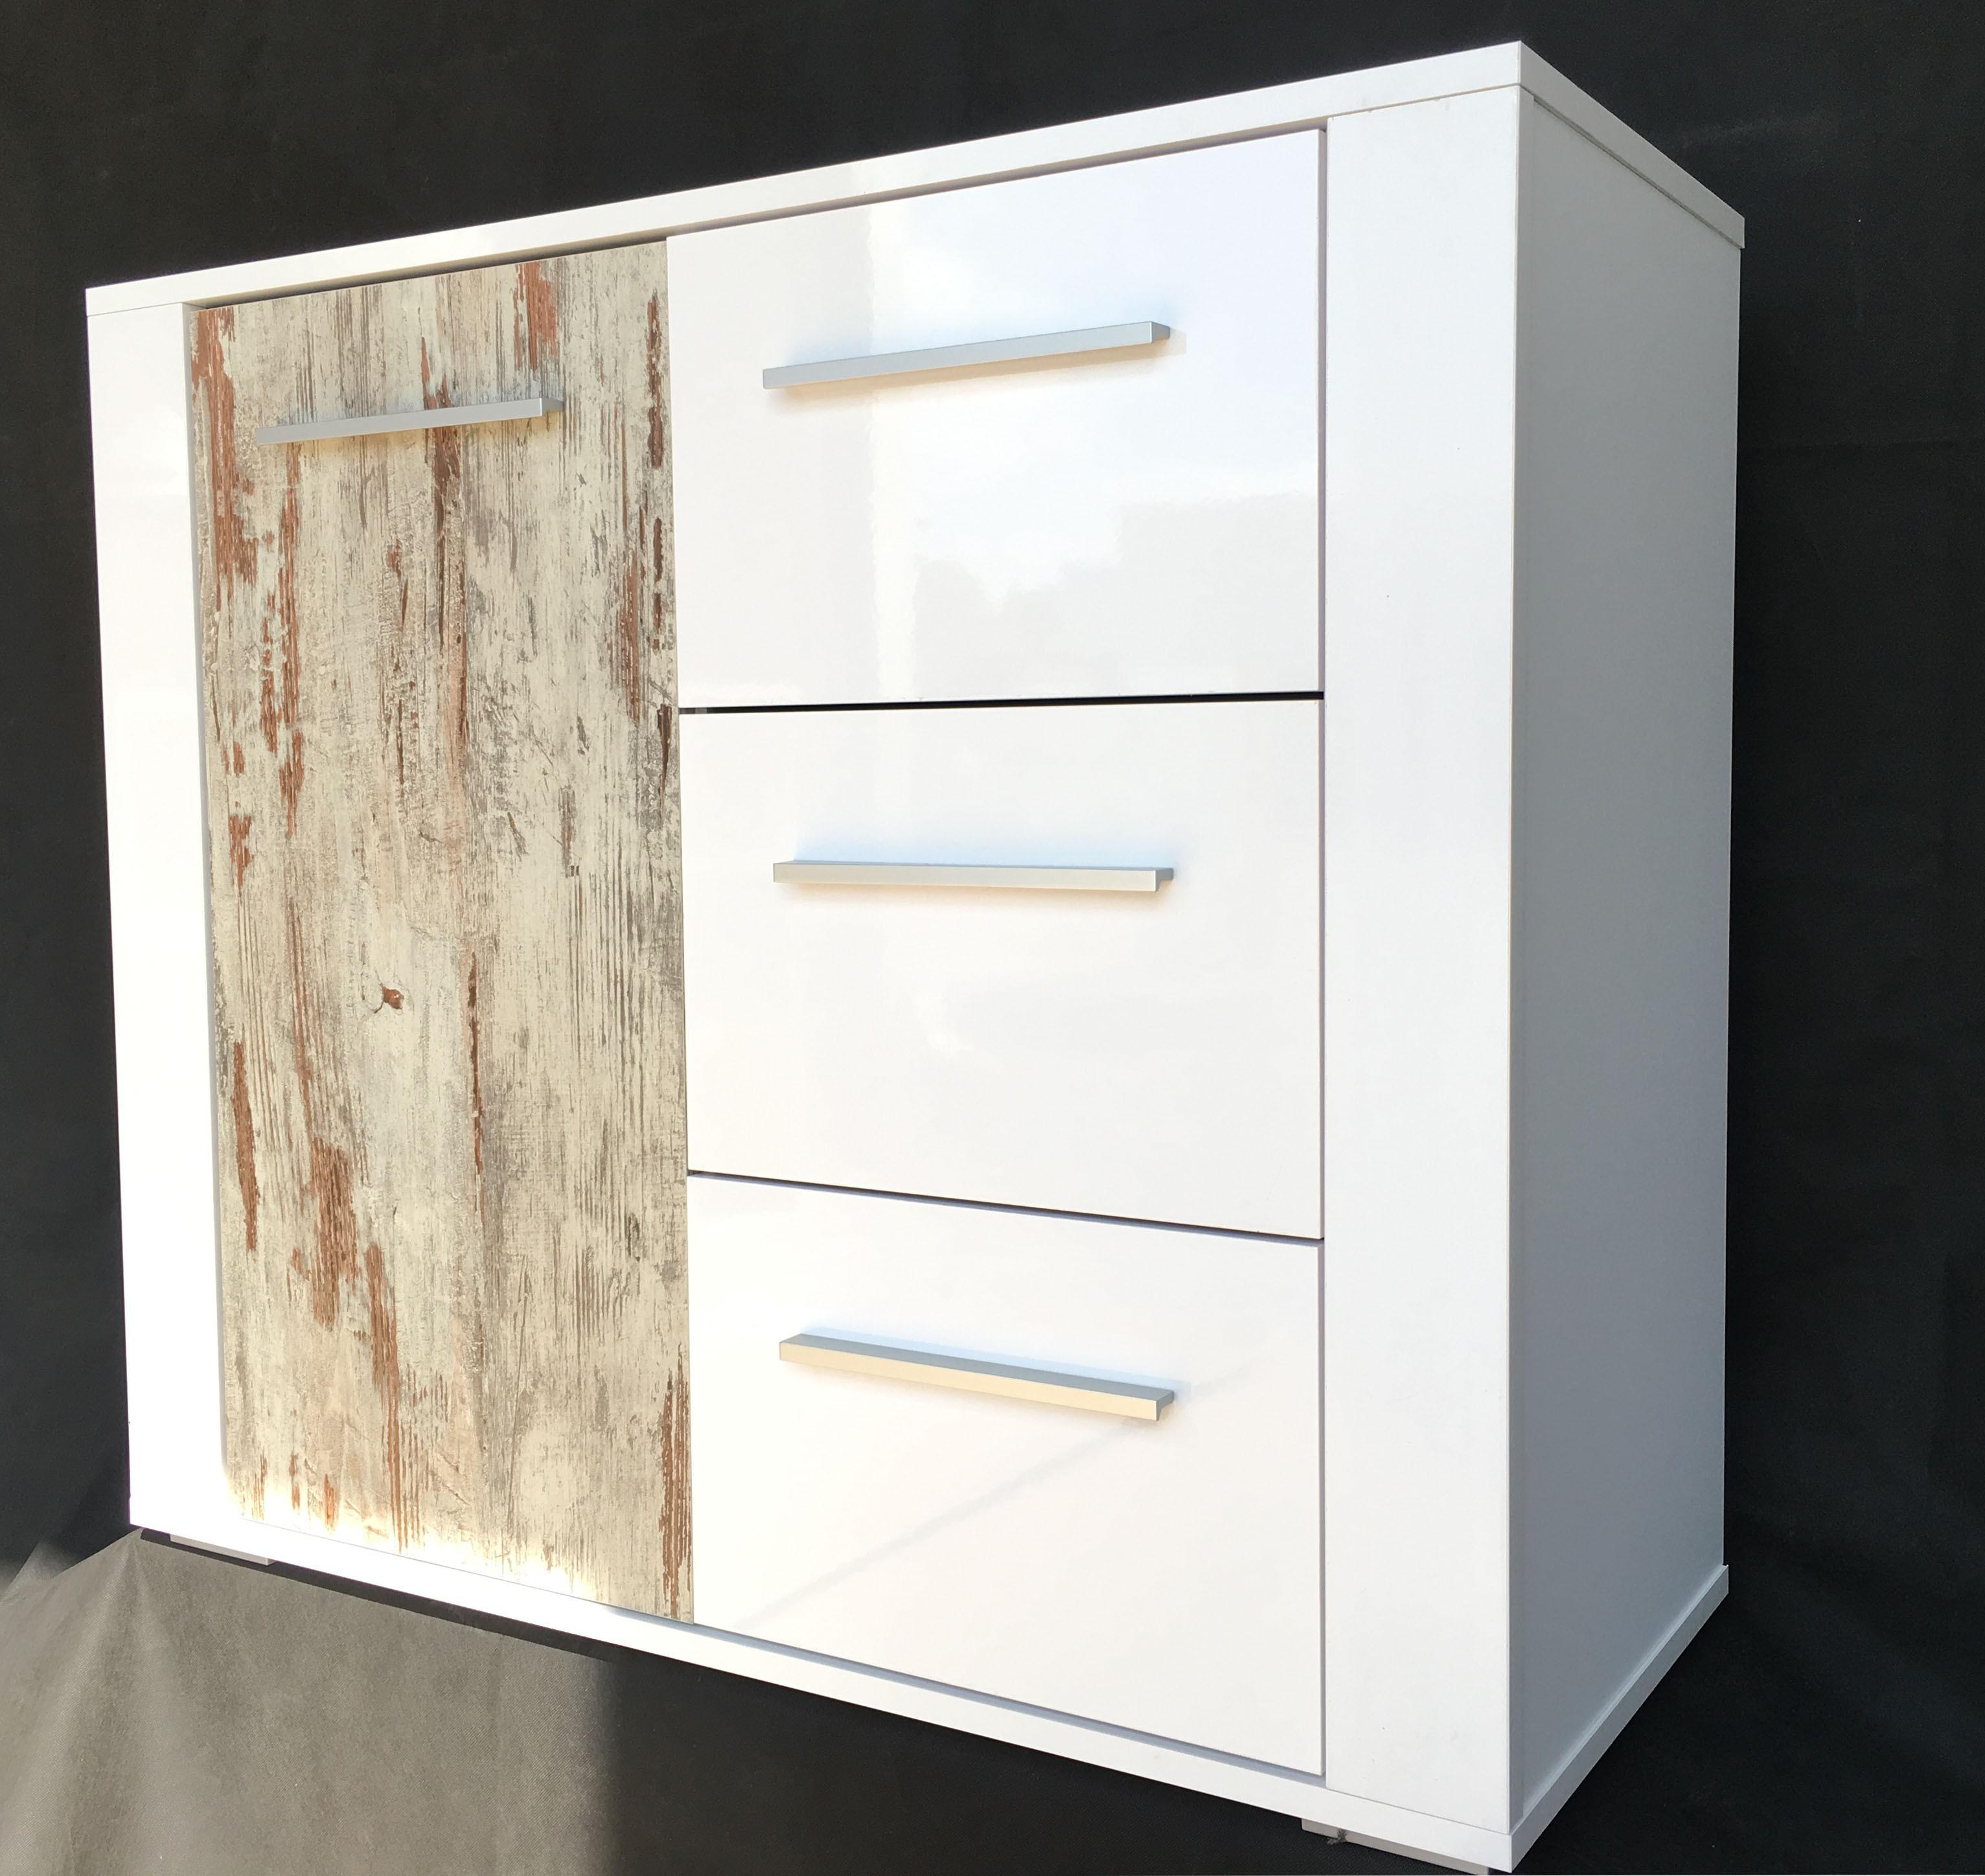 kommode mod k505 weiss hochglanz retro design h c m bel. Black Bedroom Furniture Sets. Home Design Ideas